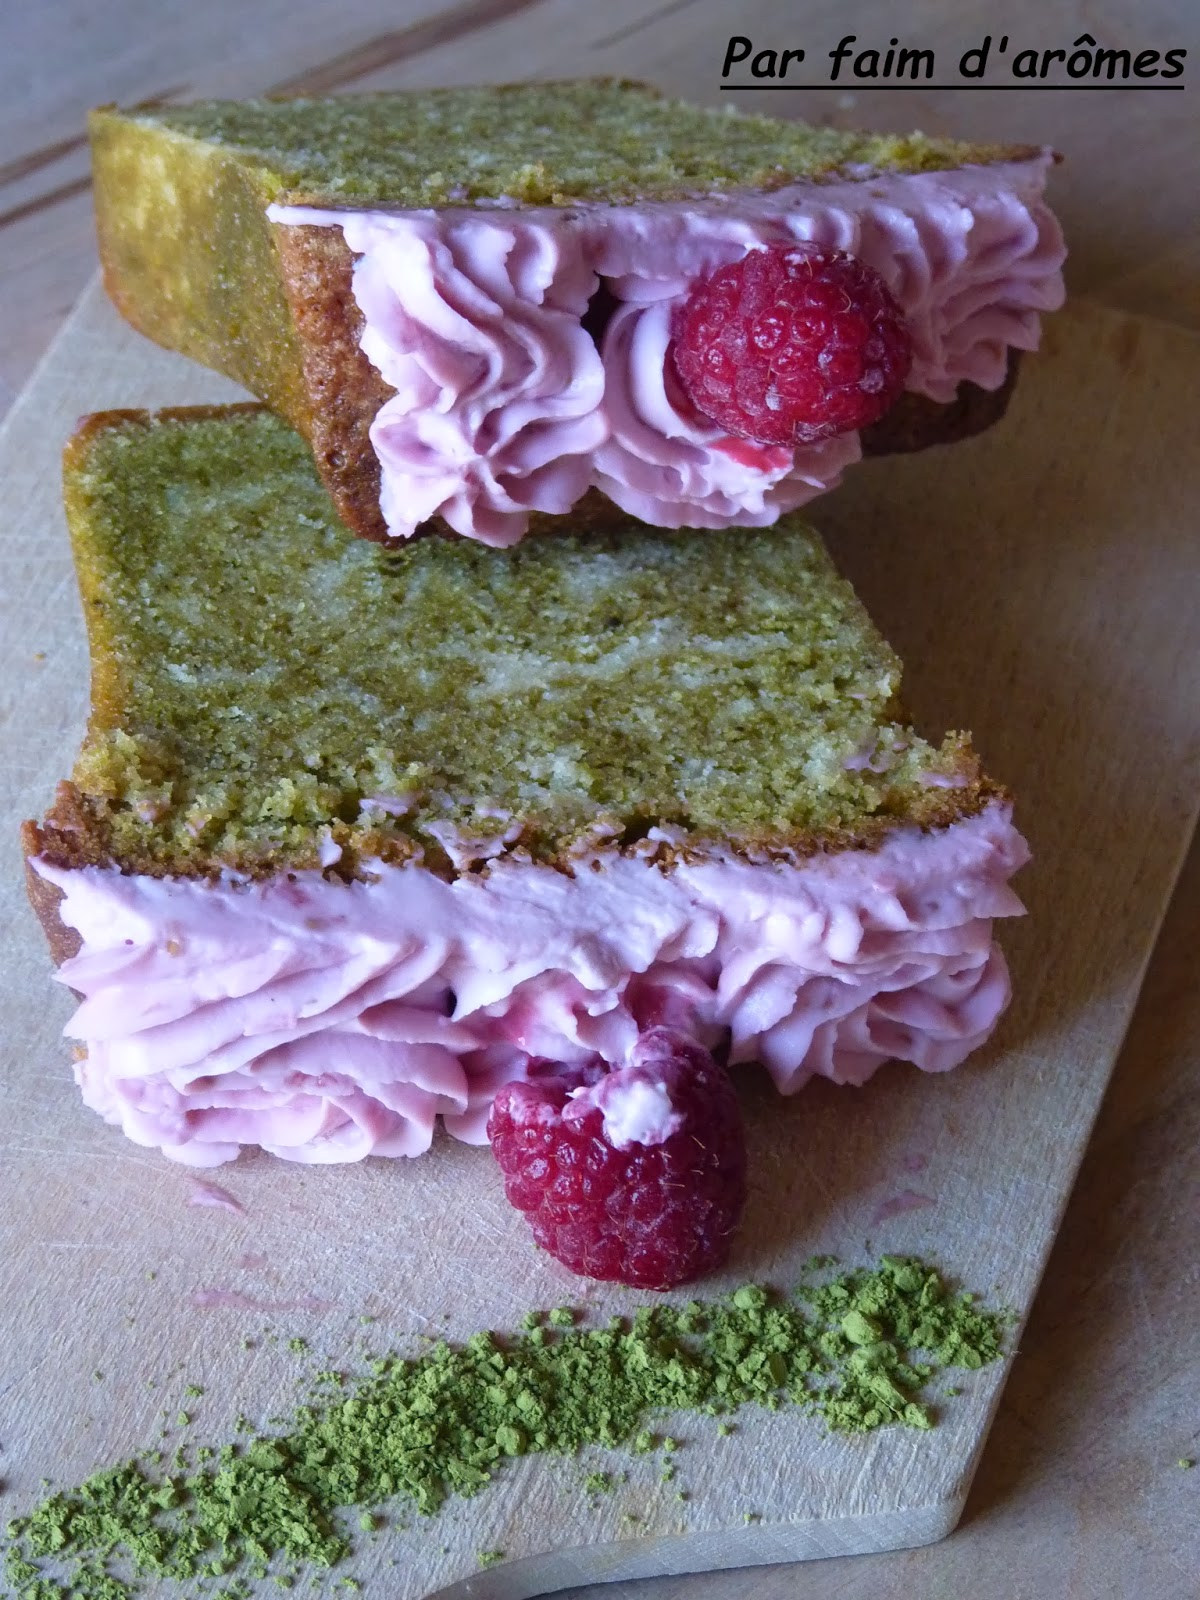 Cake marbré thé matcha et framboise